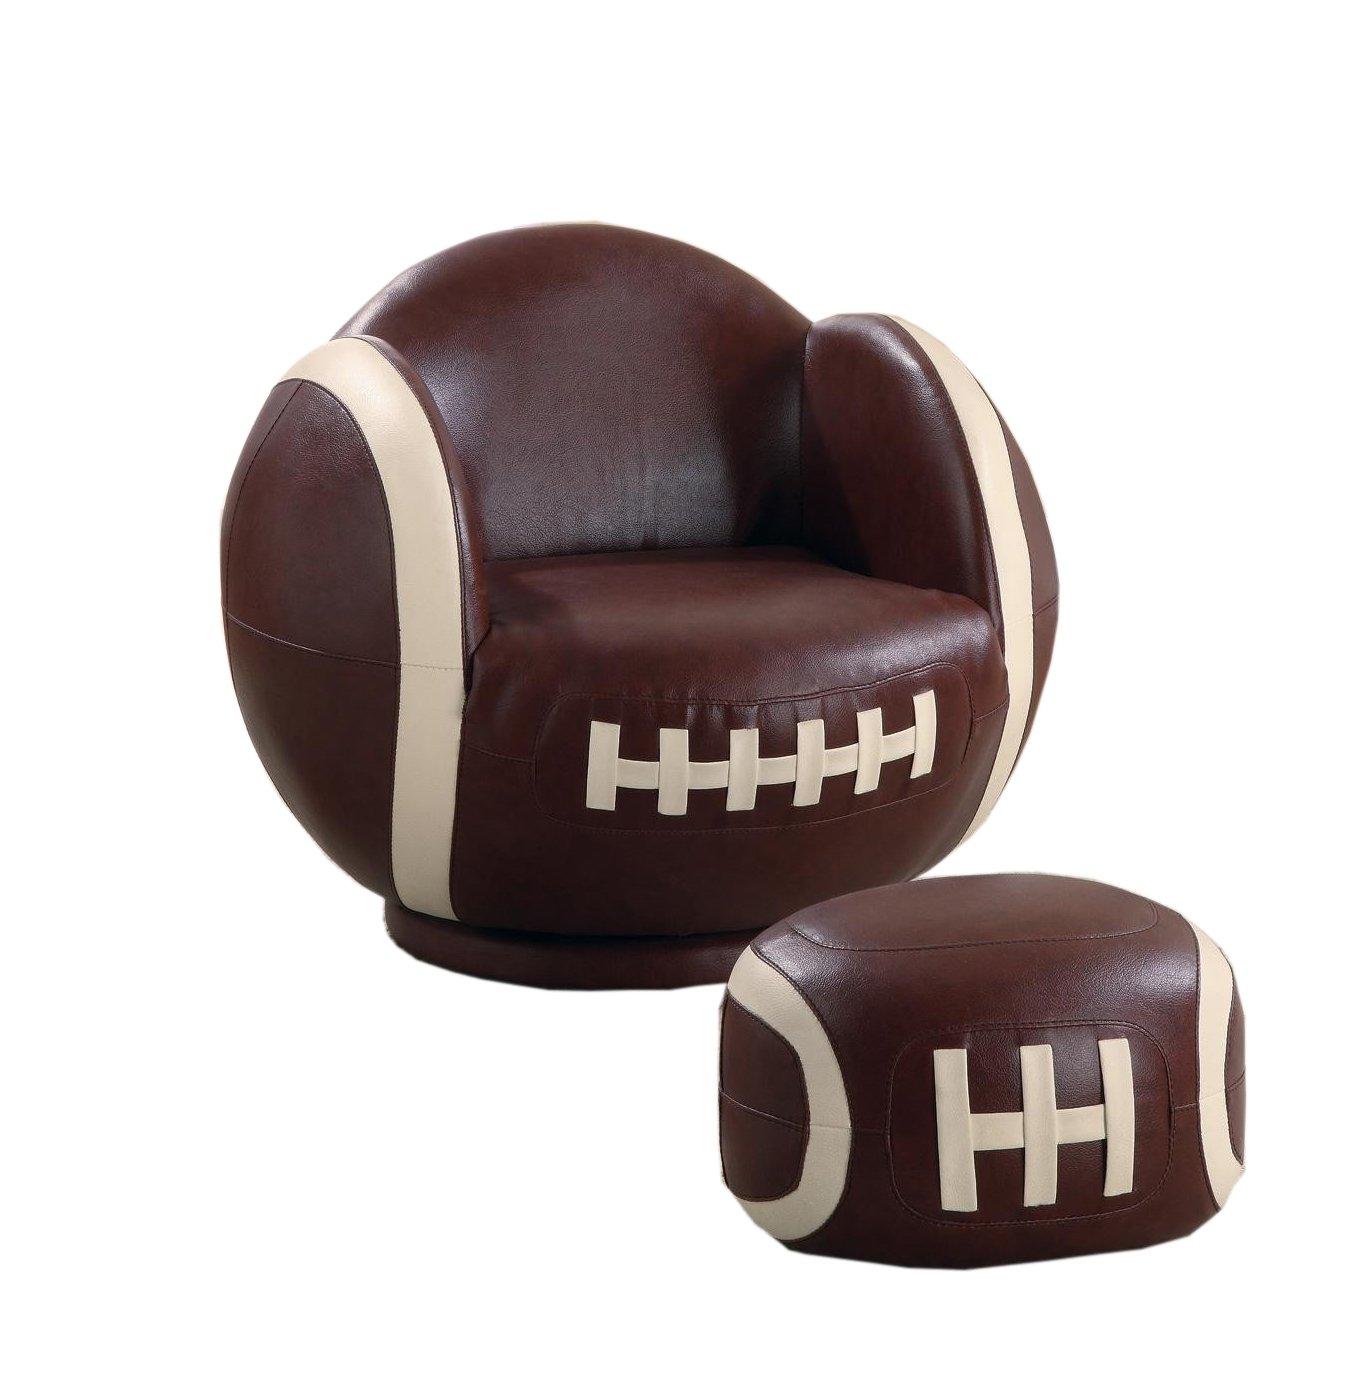 Coaster Home Furnishings Casual Chair, White and Brown by Coaster Home Furnishings